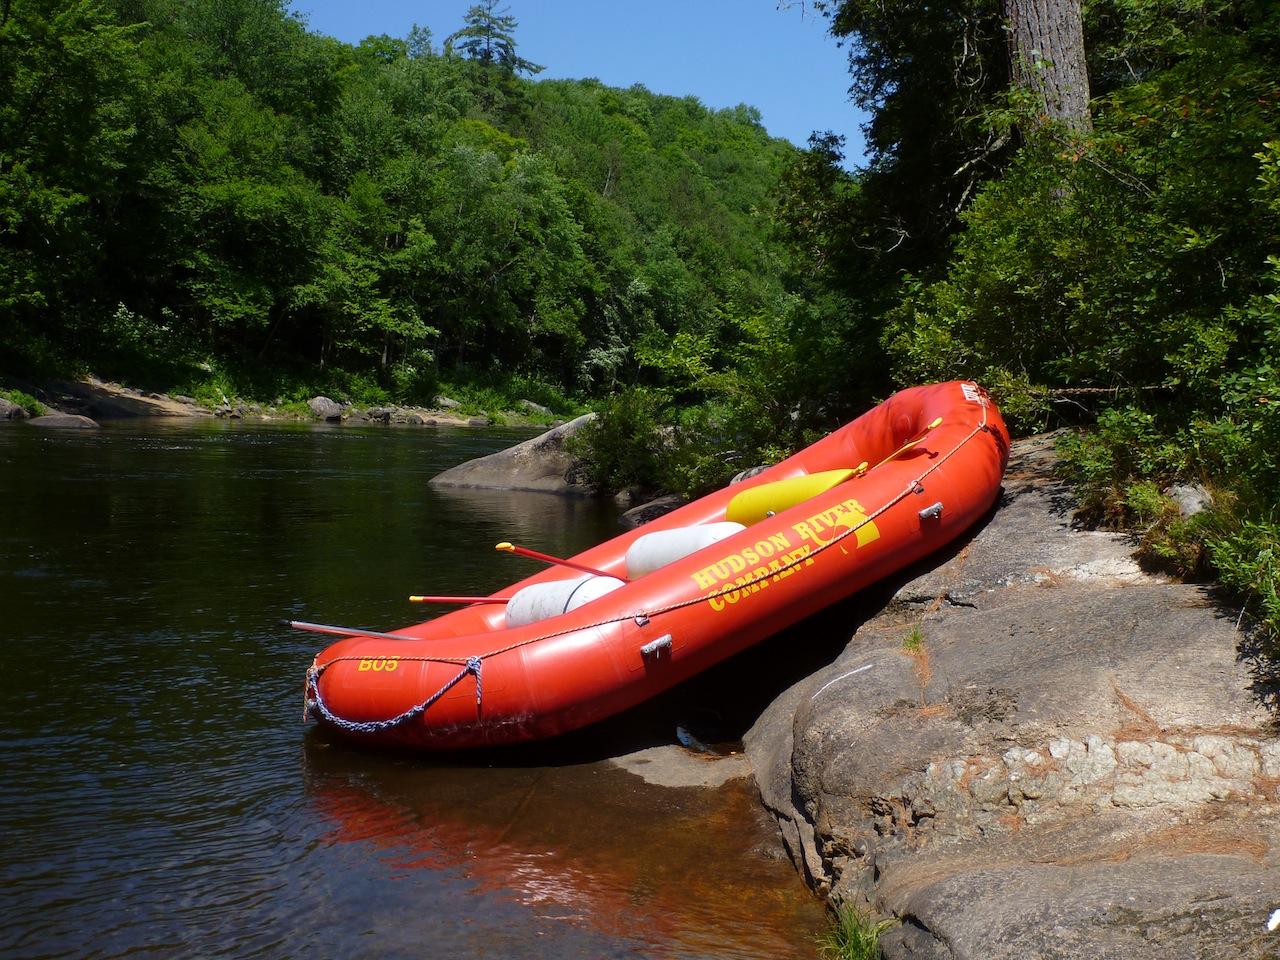 Rafting Down The Hudson River In The Adirondacks